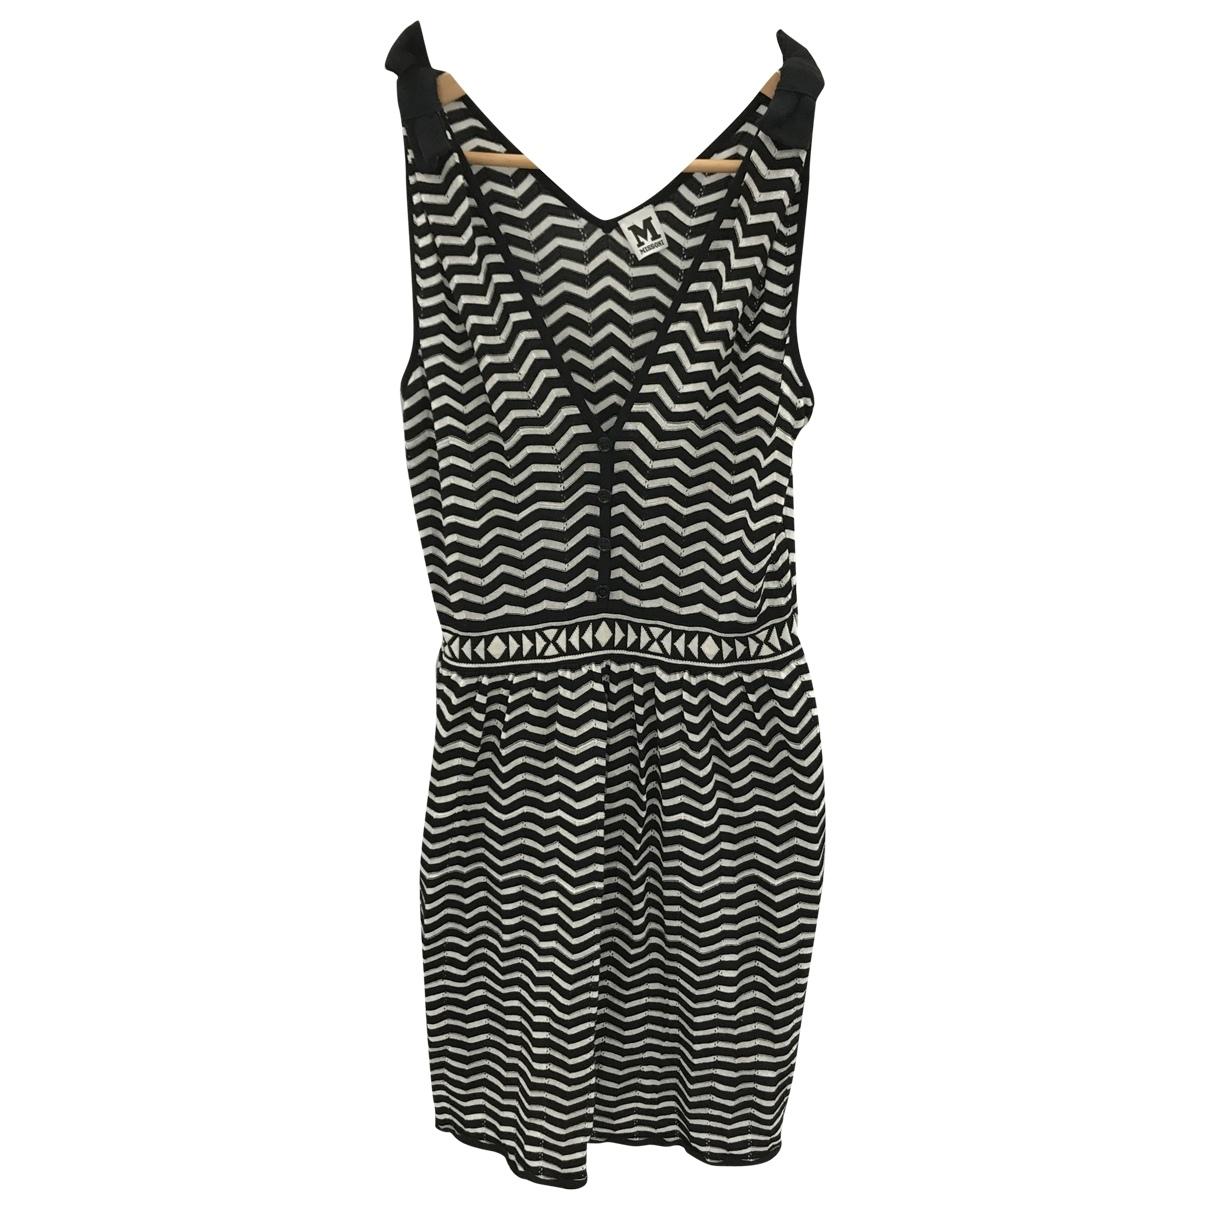 M Missoni \N Black Cotton dress for Women 46 IT